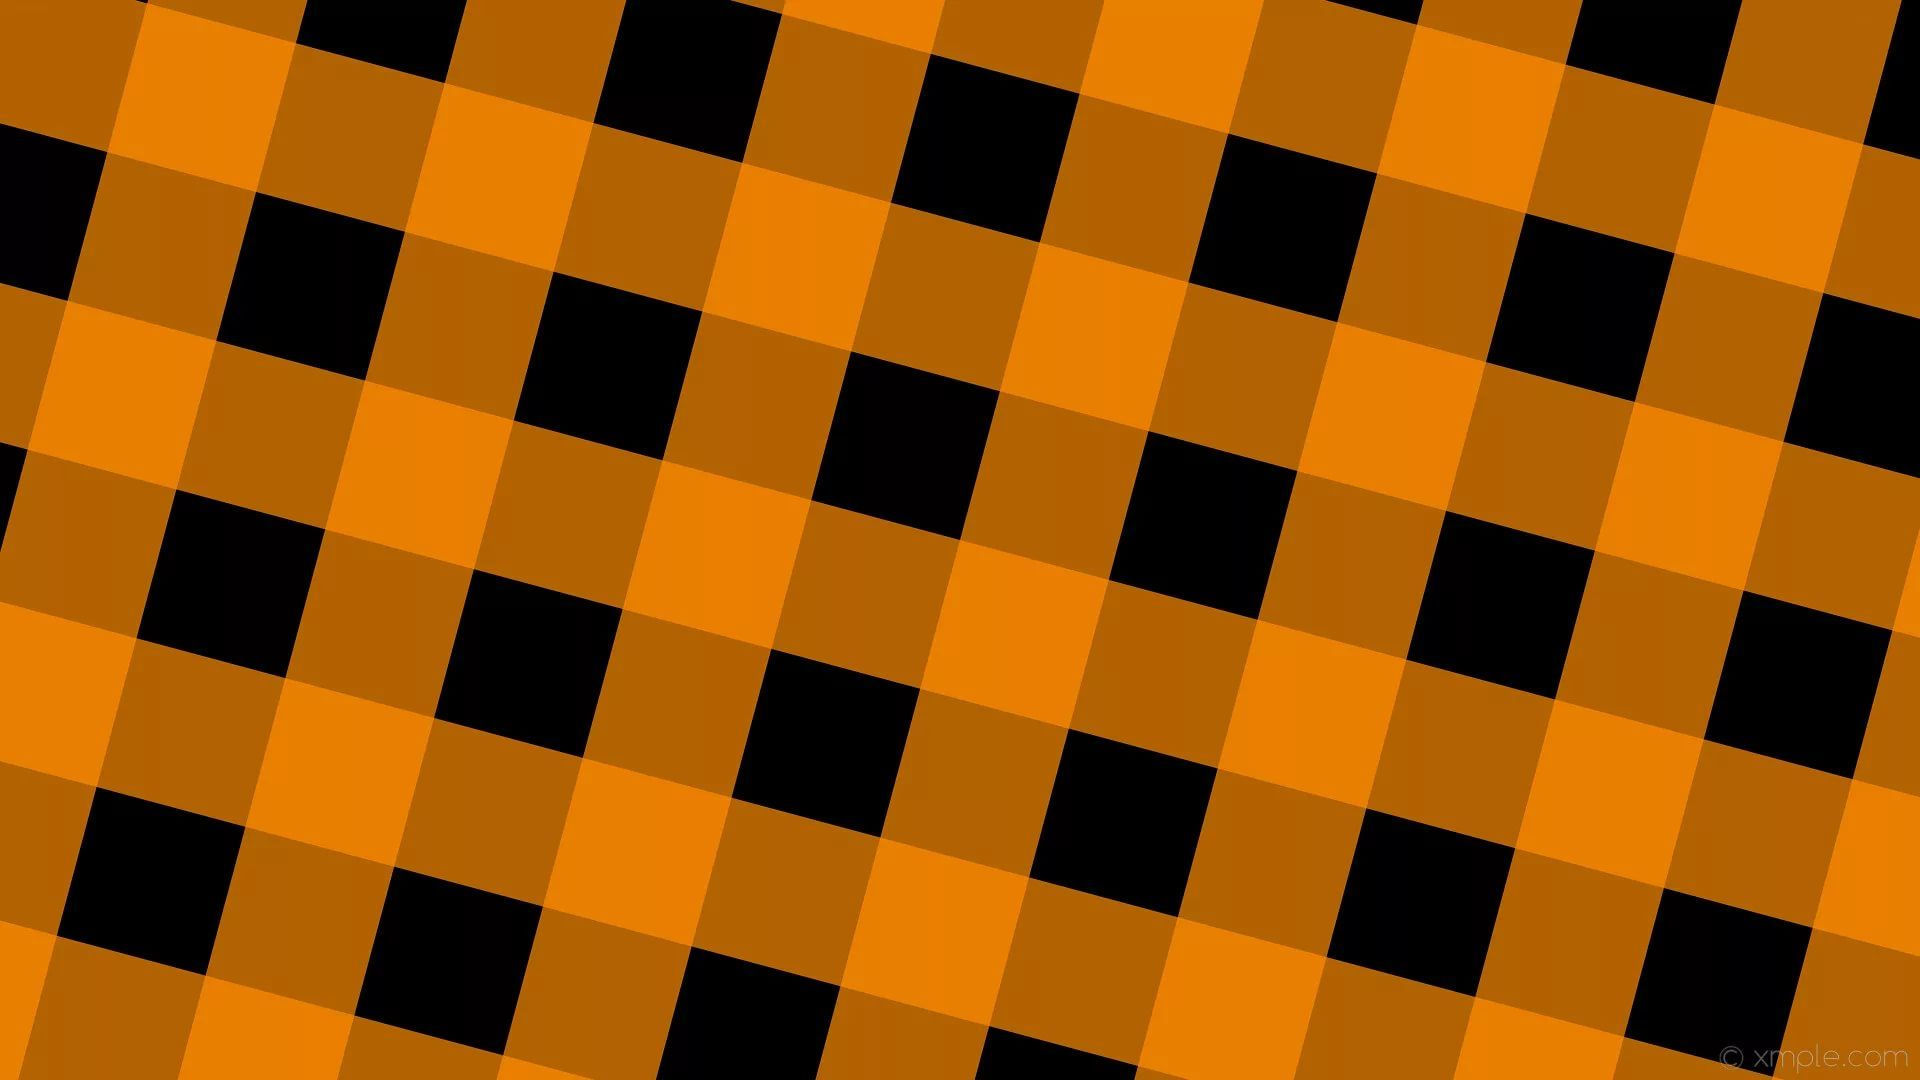 Black And Orange wallpaper photo